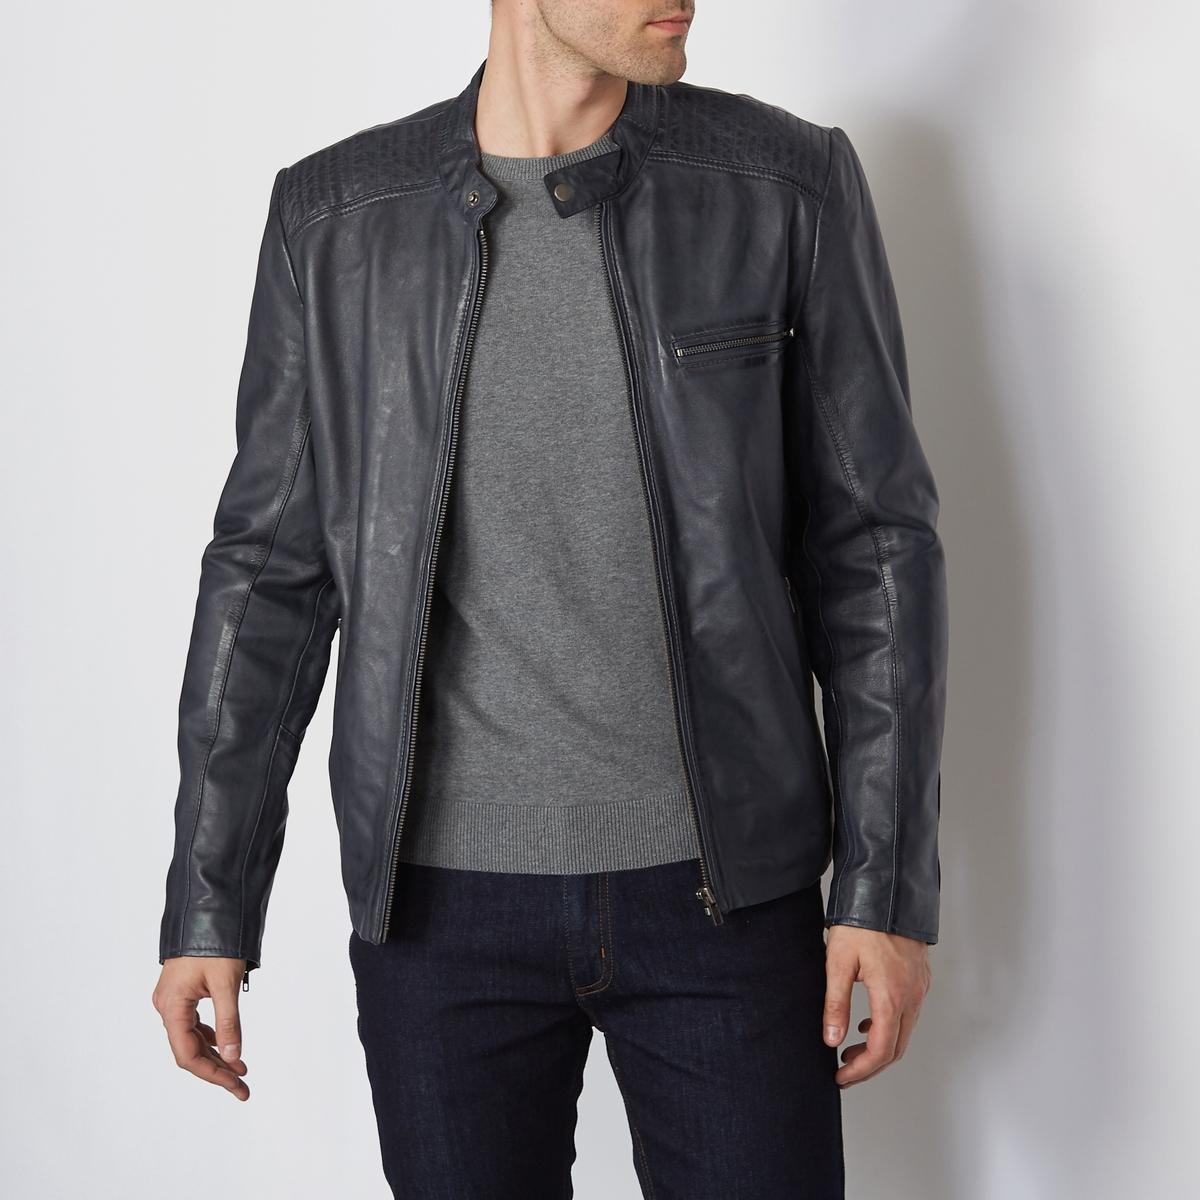 Кожаный блузон